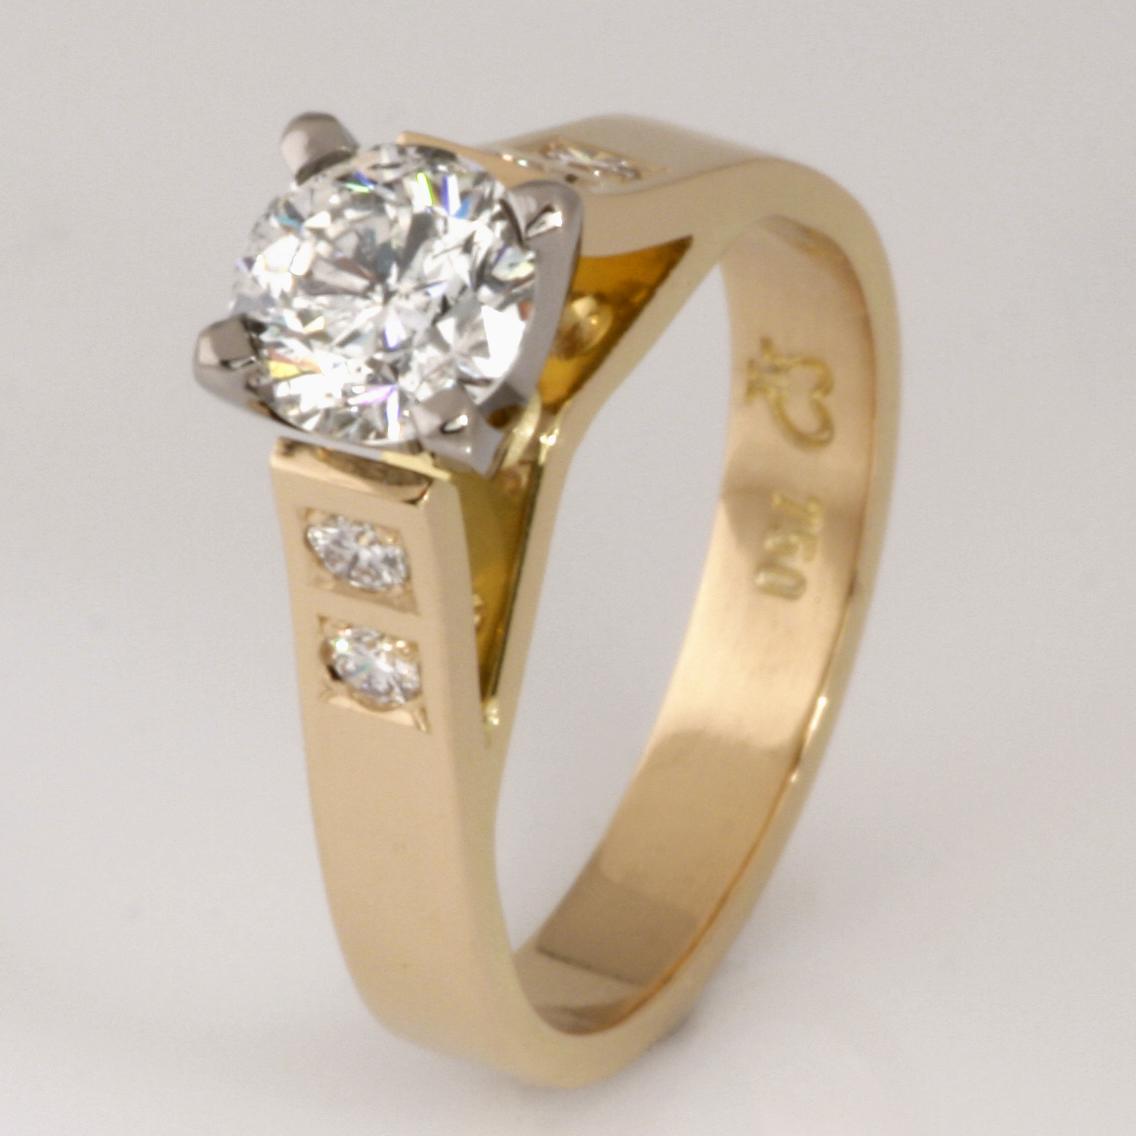 Handmade ladies 18ct yellow and white gold brilliant cut diamond engagement ring